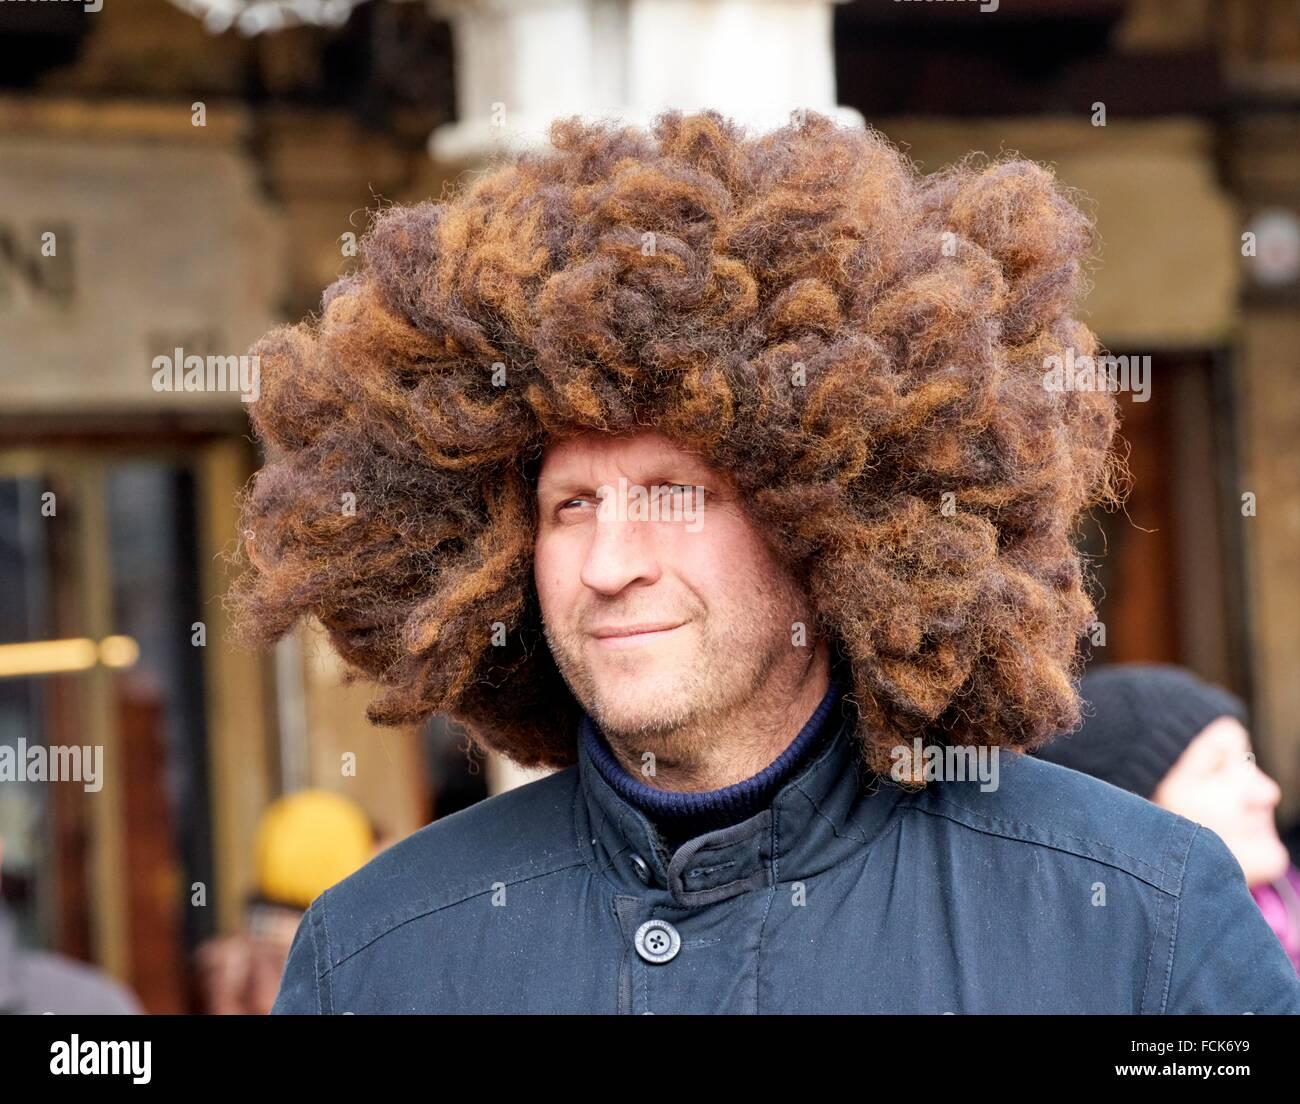 Man with wig 6606b01fb